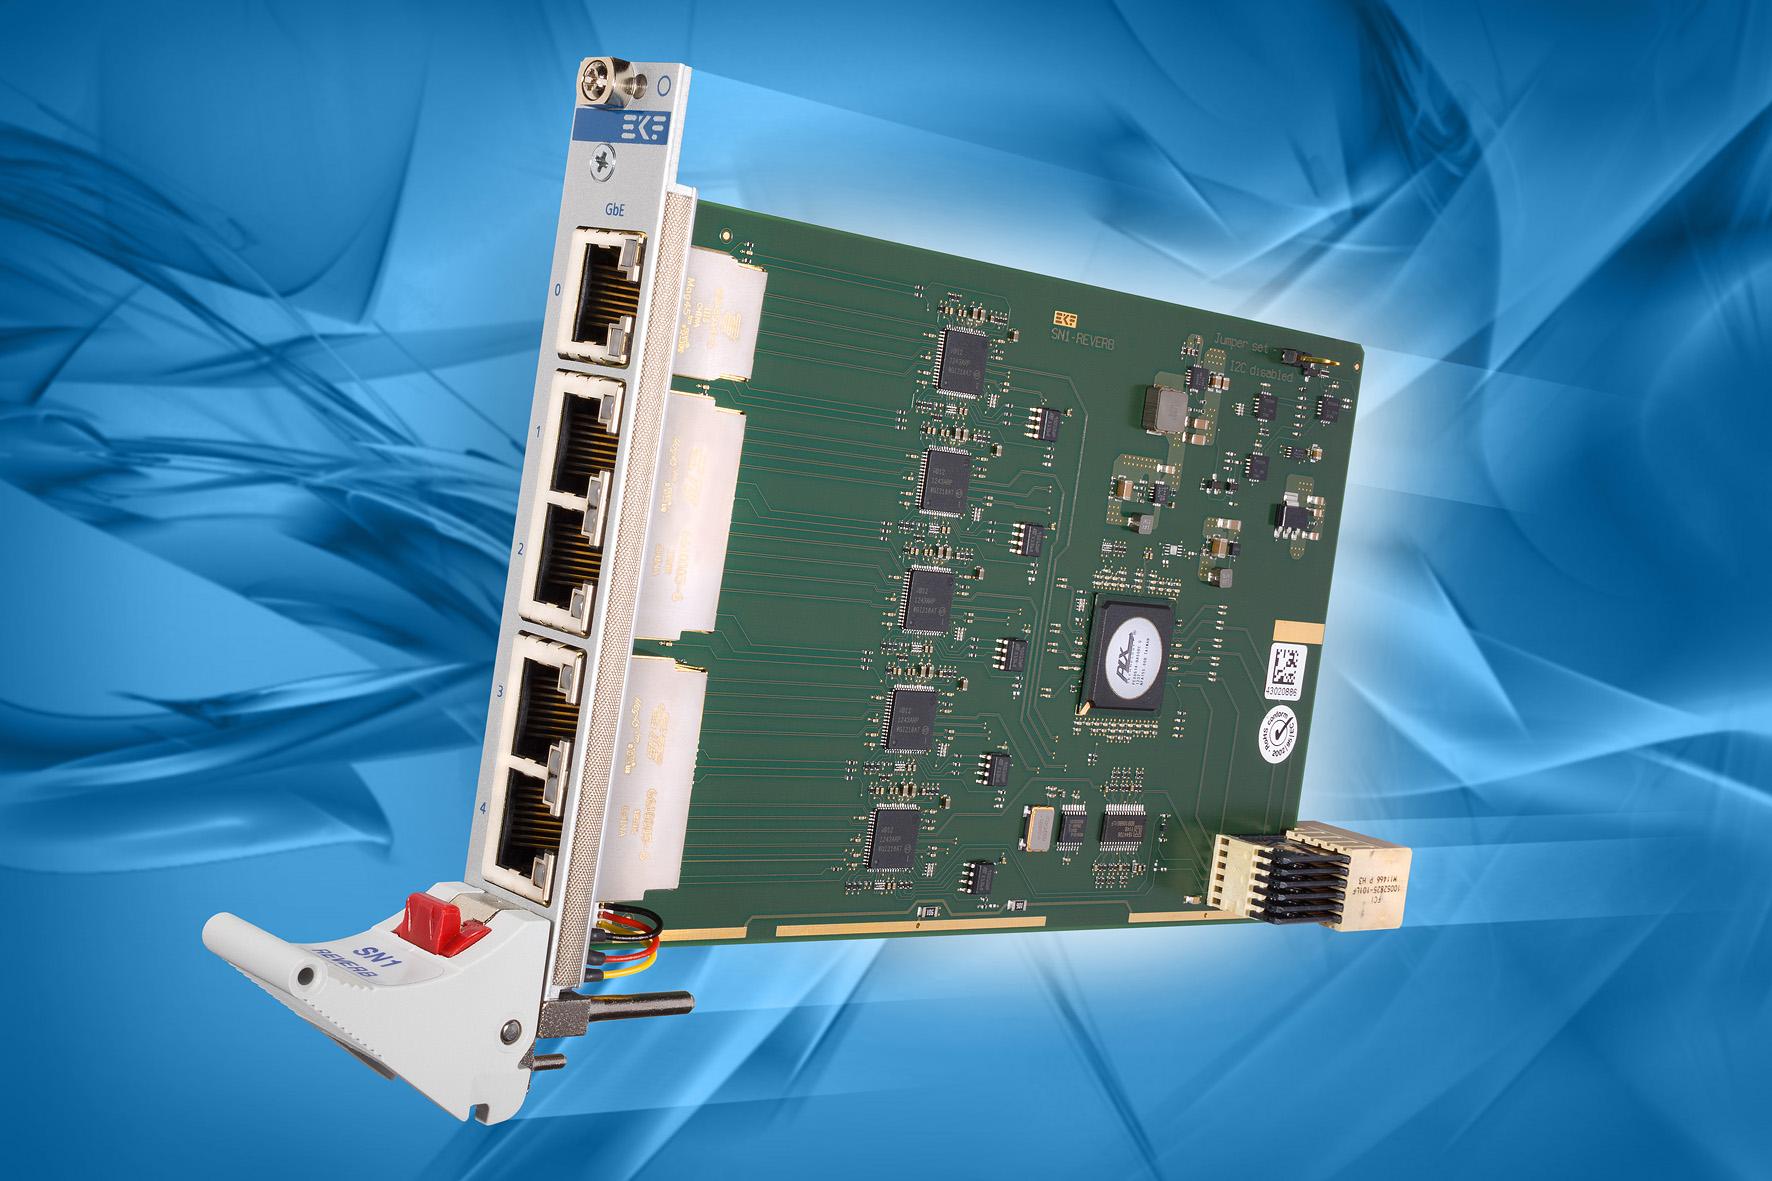 EKF CompactPCI® Serial Products: SN1-REVERB • 5-Port Gigabit